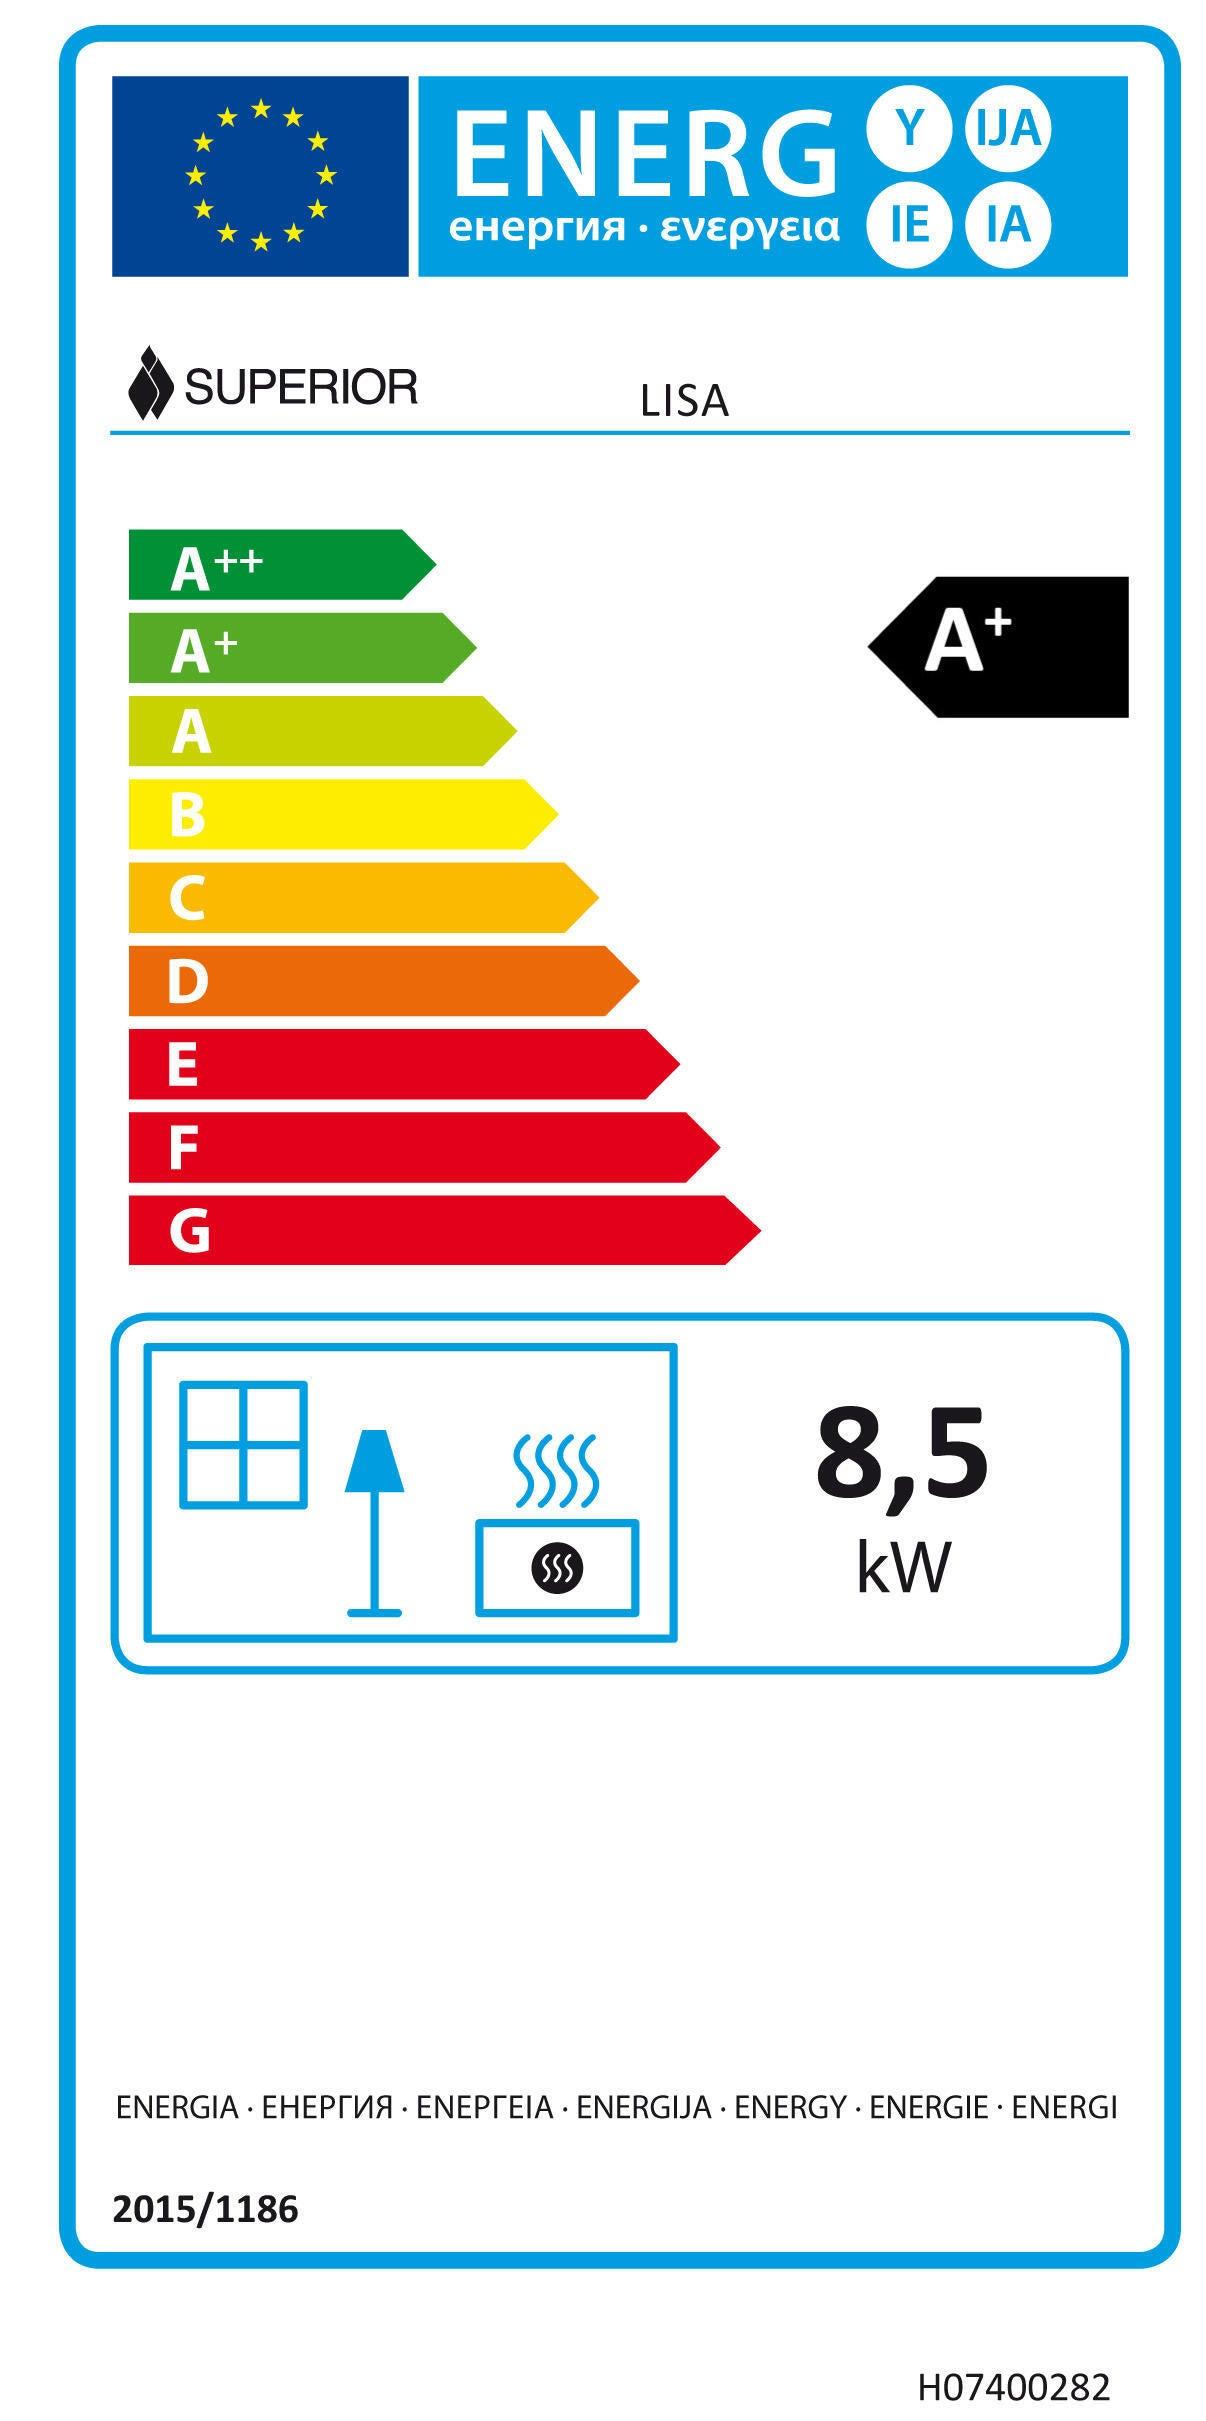 Stufa a pellet Lisa 8.5 kW bordeaux - 3